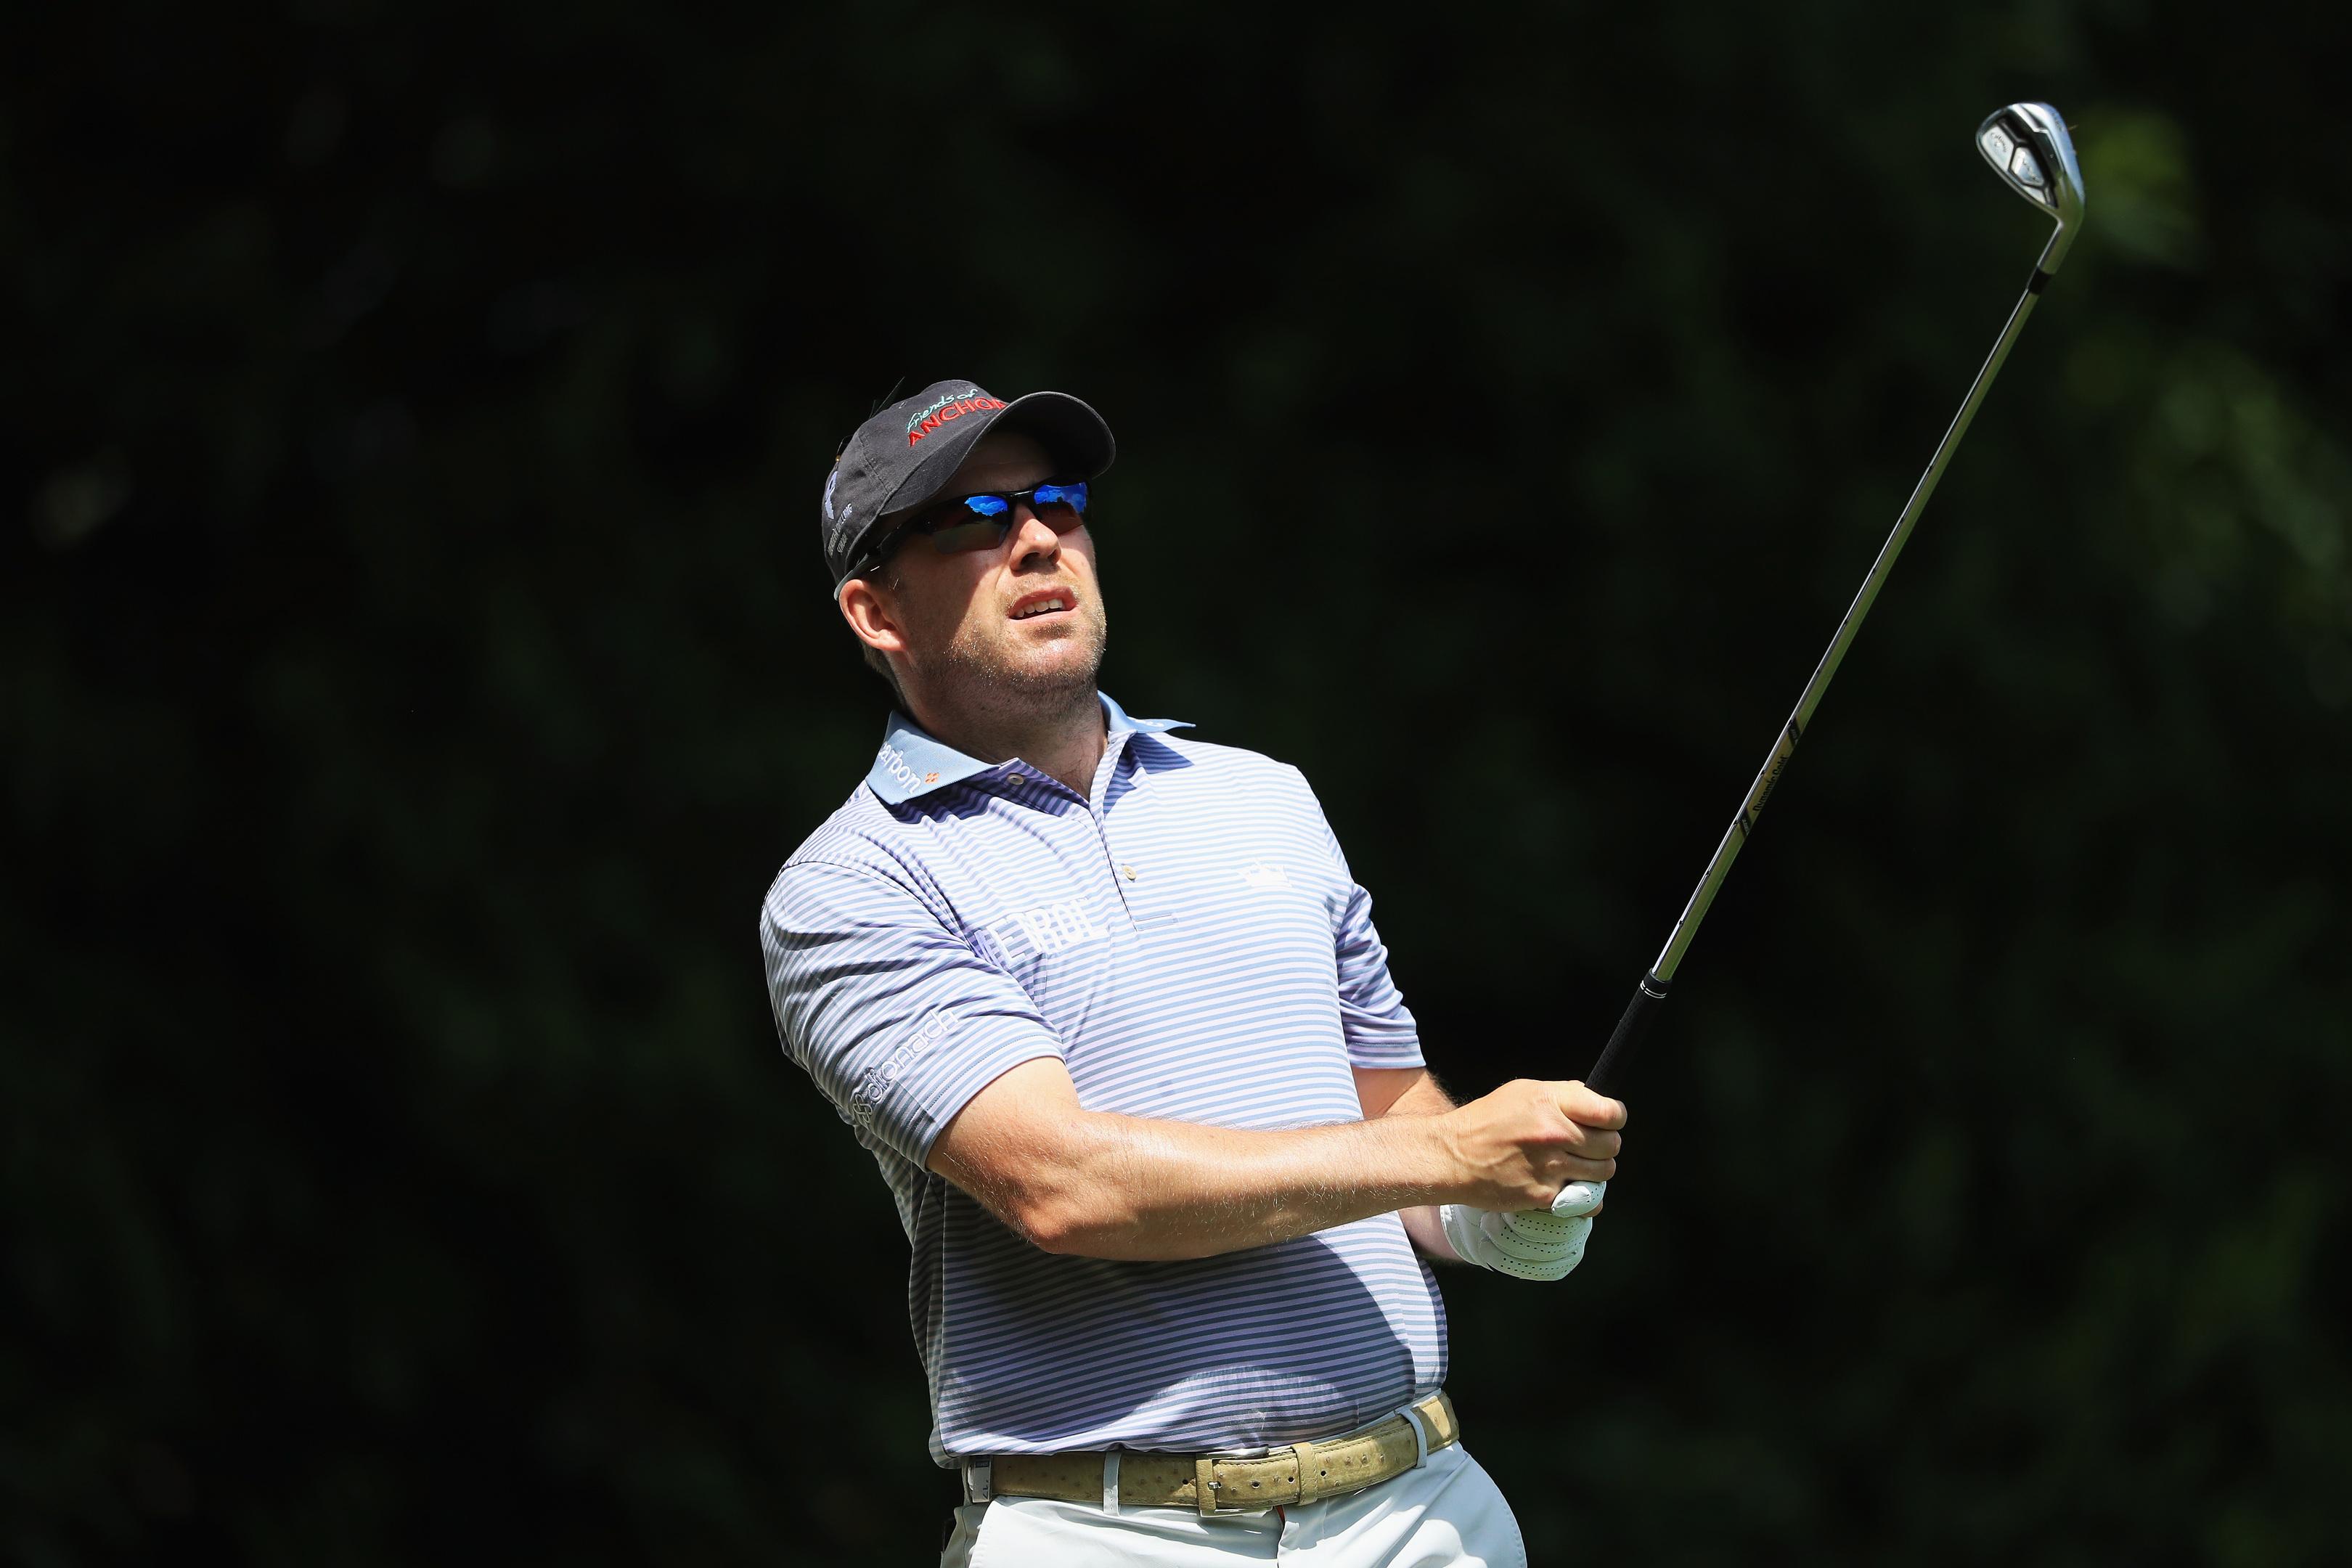 Richie Ramsay enjoying the sunshine at the BMW PGA Championship at Wentworth.